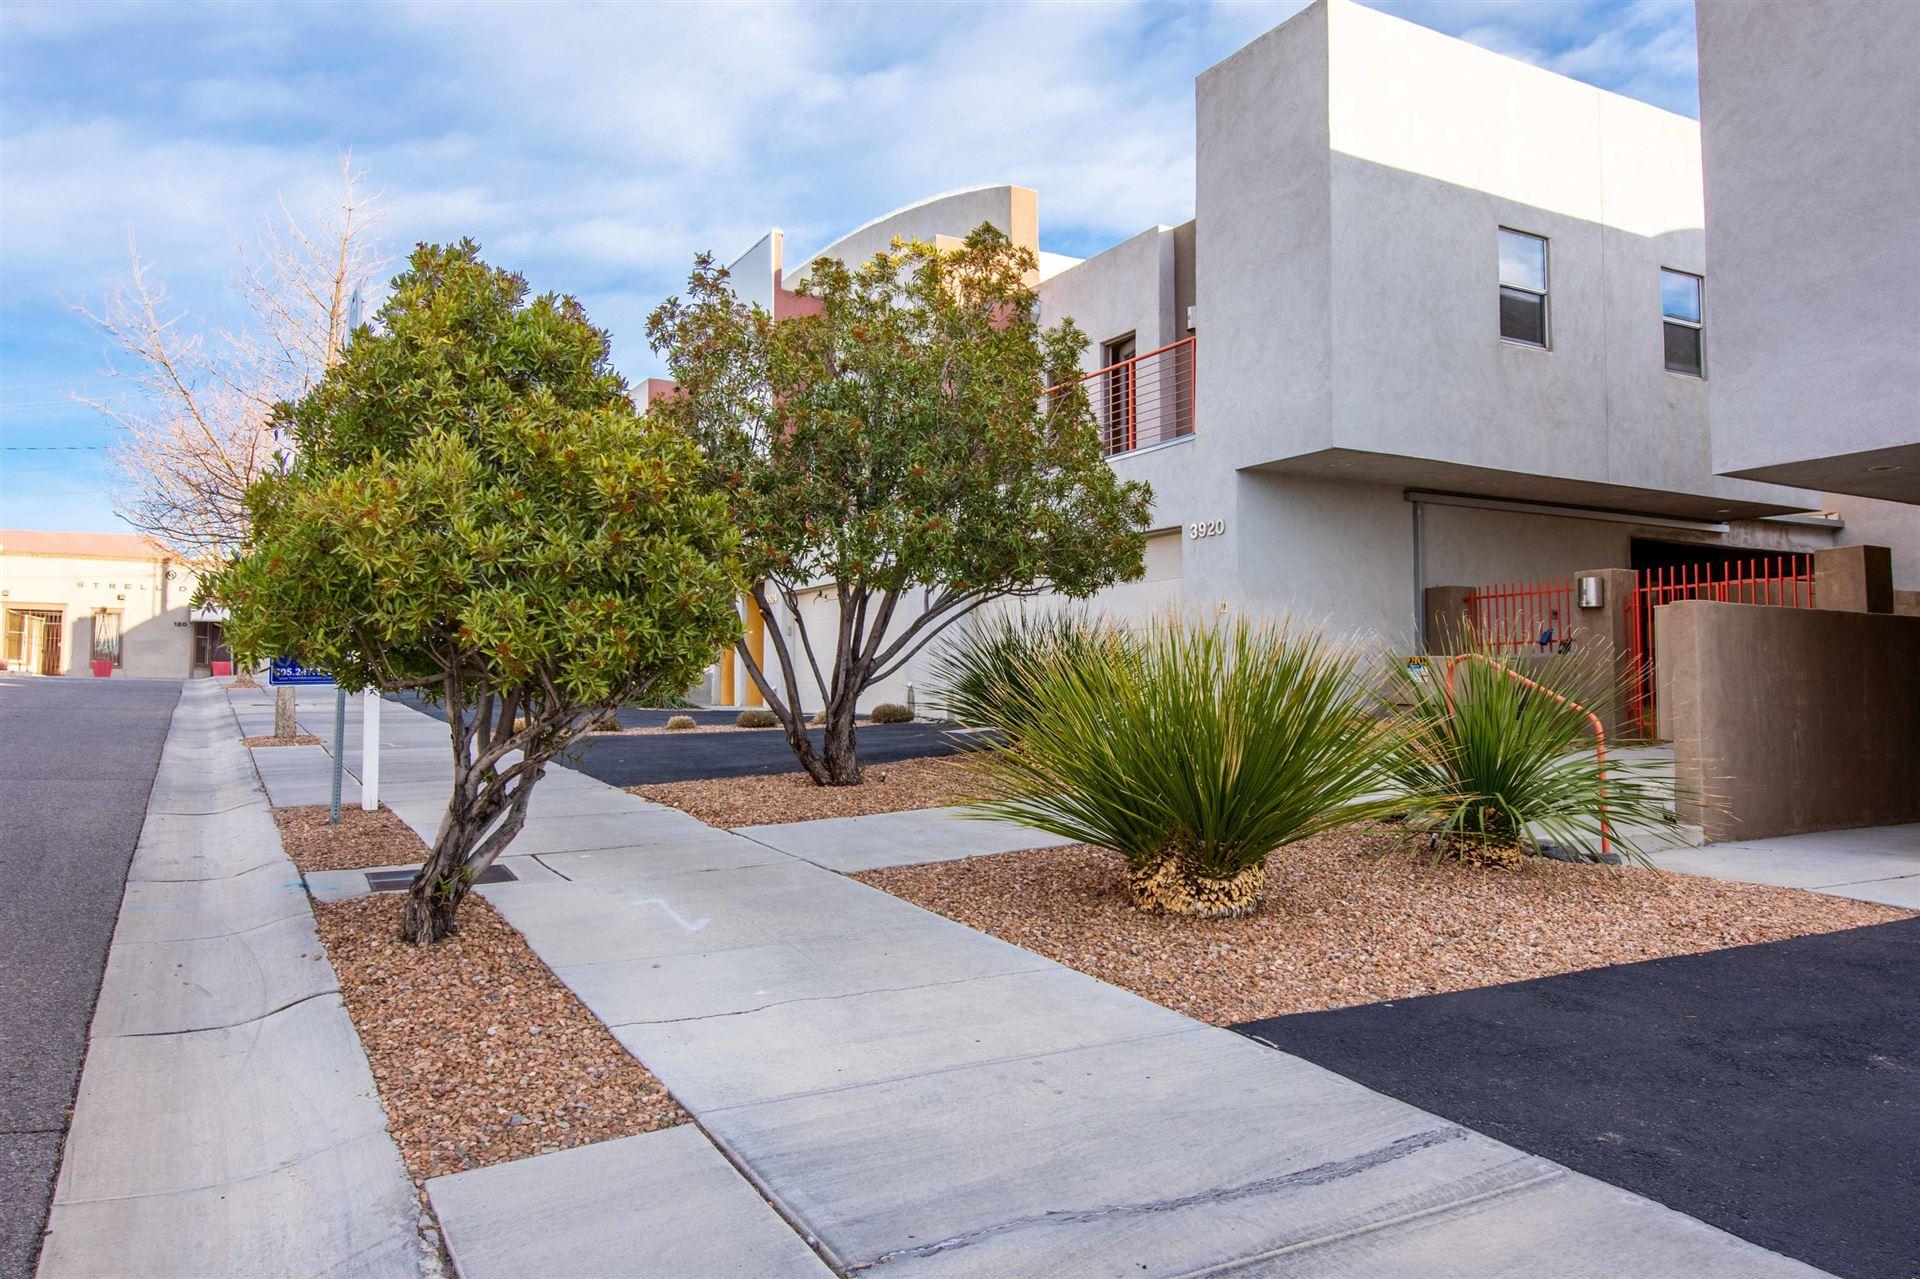 3920 SILVER Avenue SE, Albuquerque, NM 87108 - MLS#: 985719